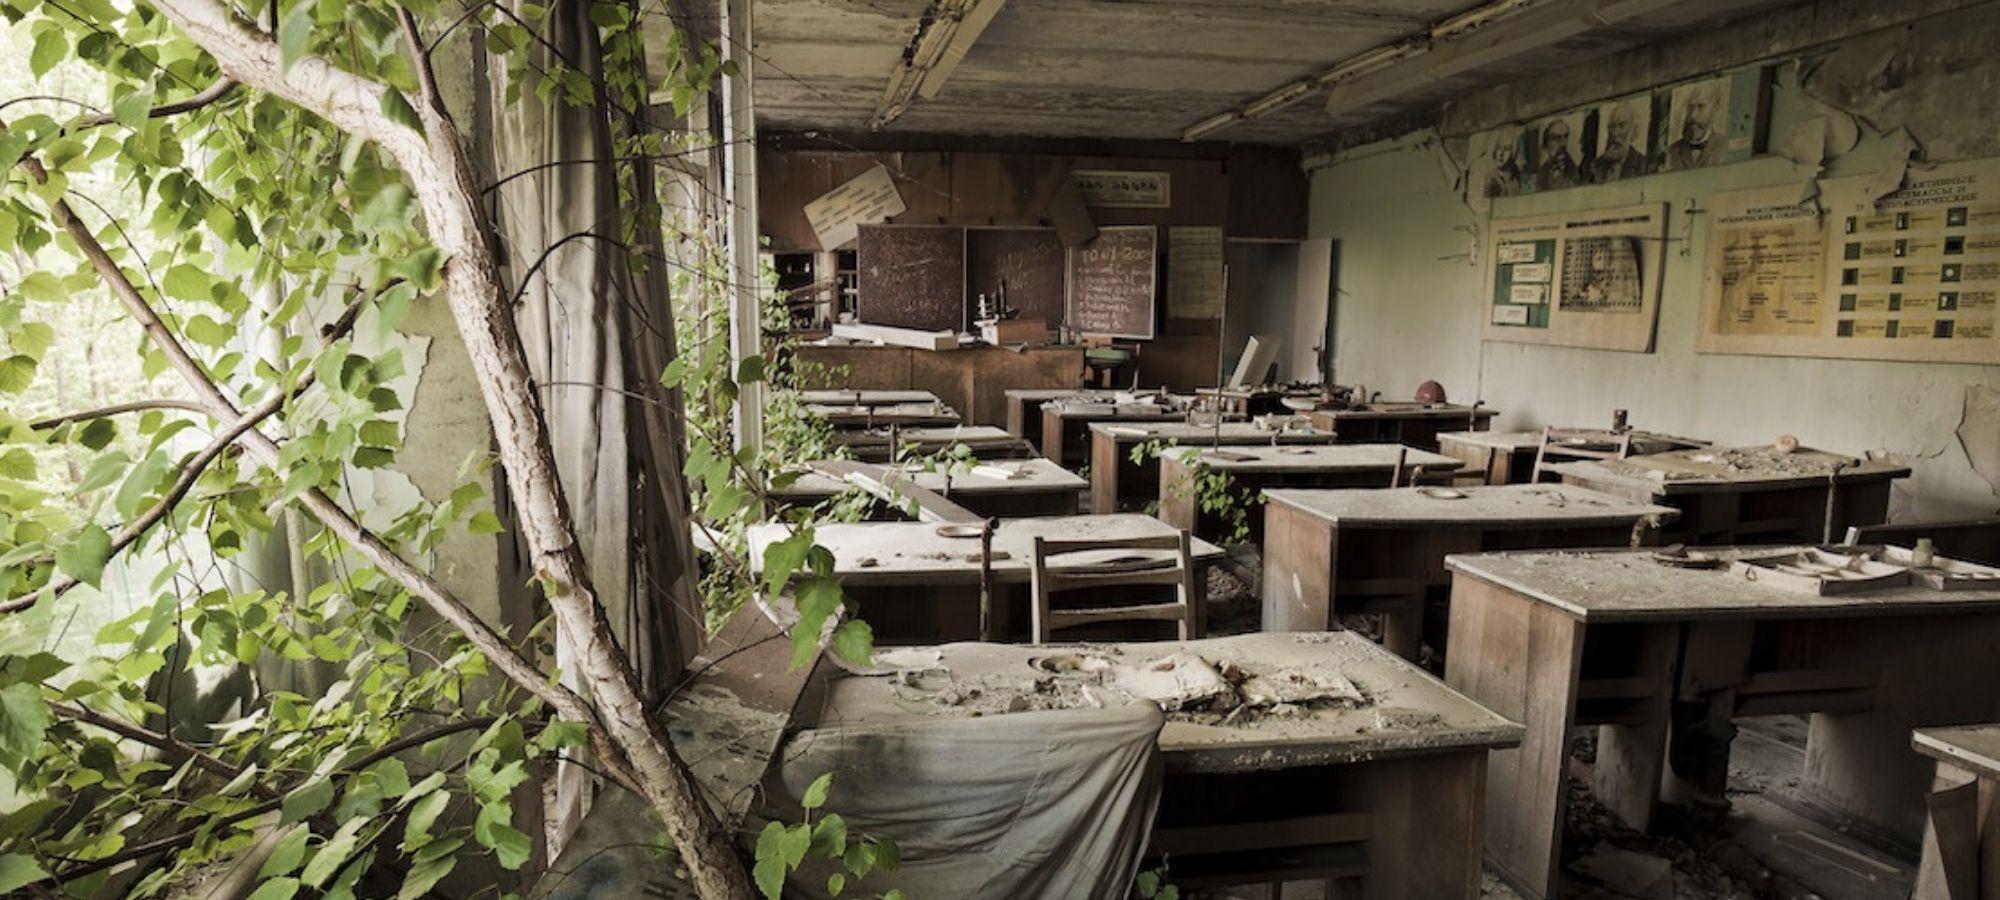 Chernobyl nelle fotografie di Gerd Ludwig